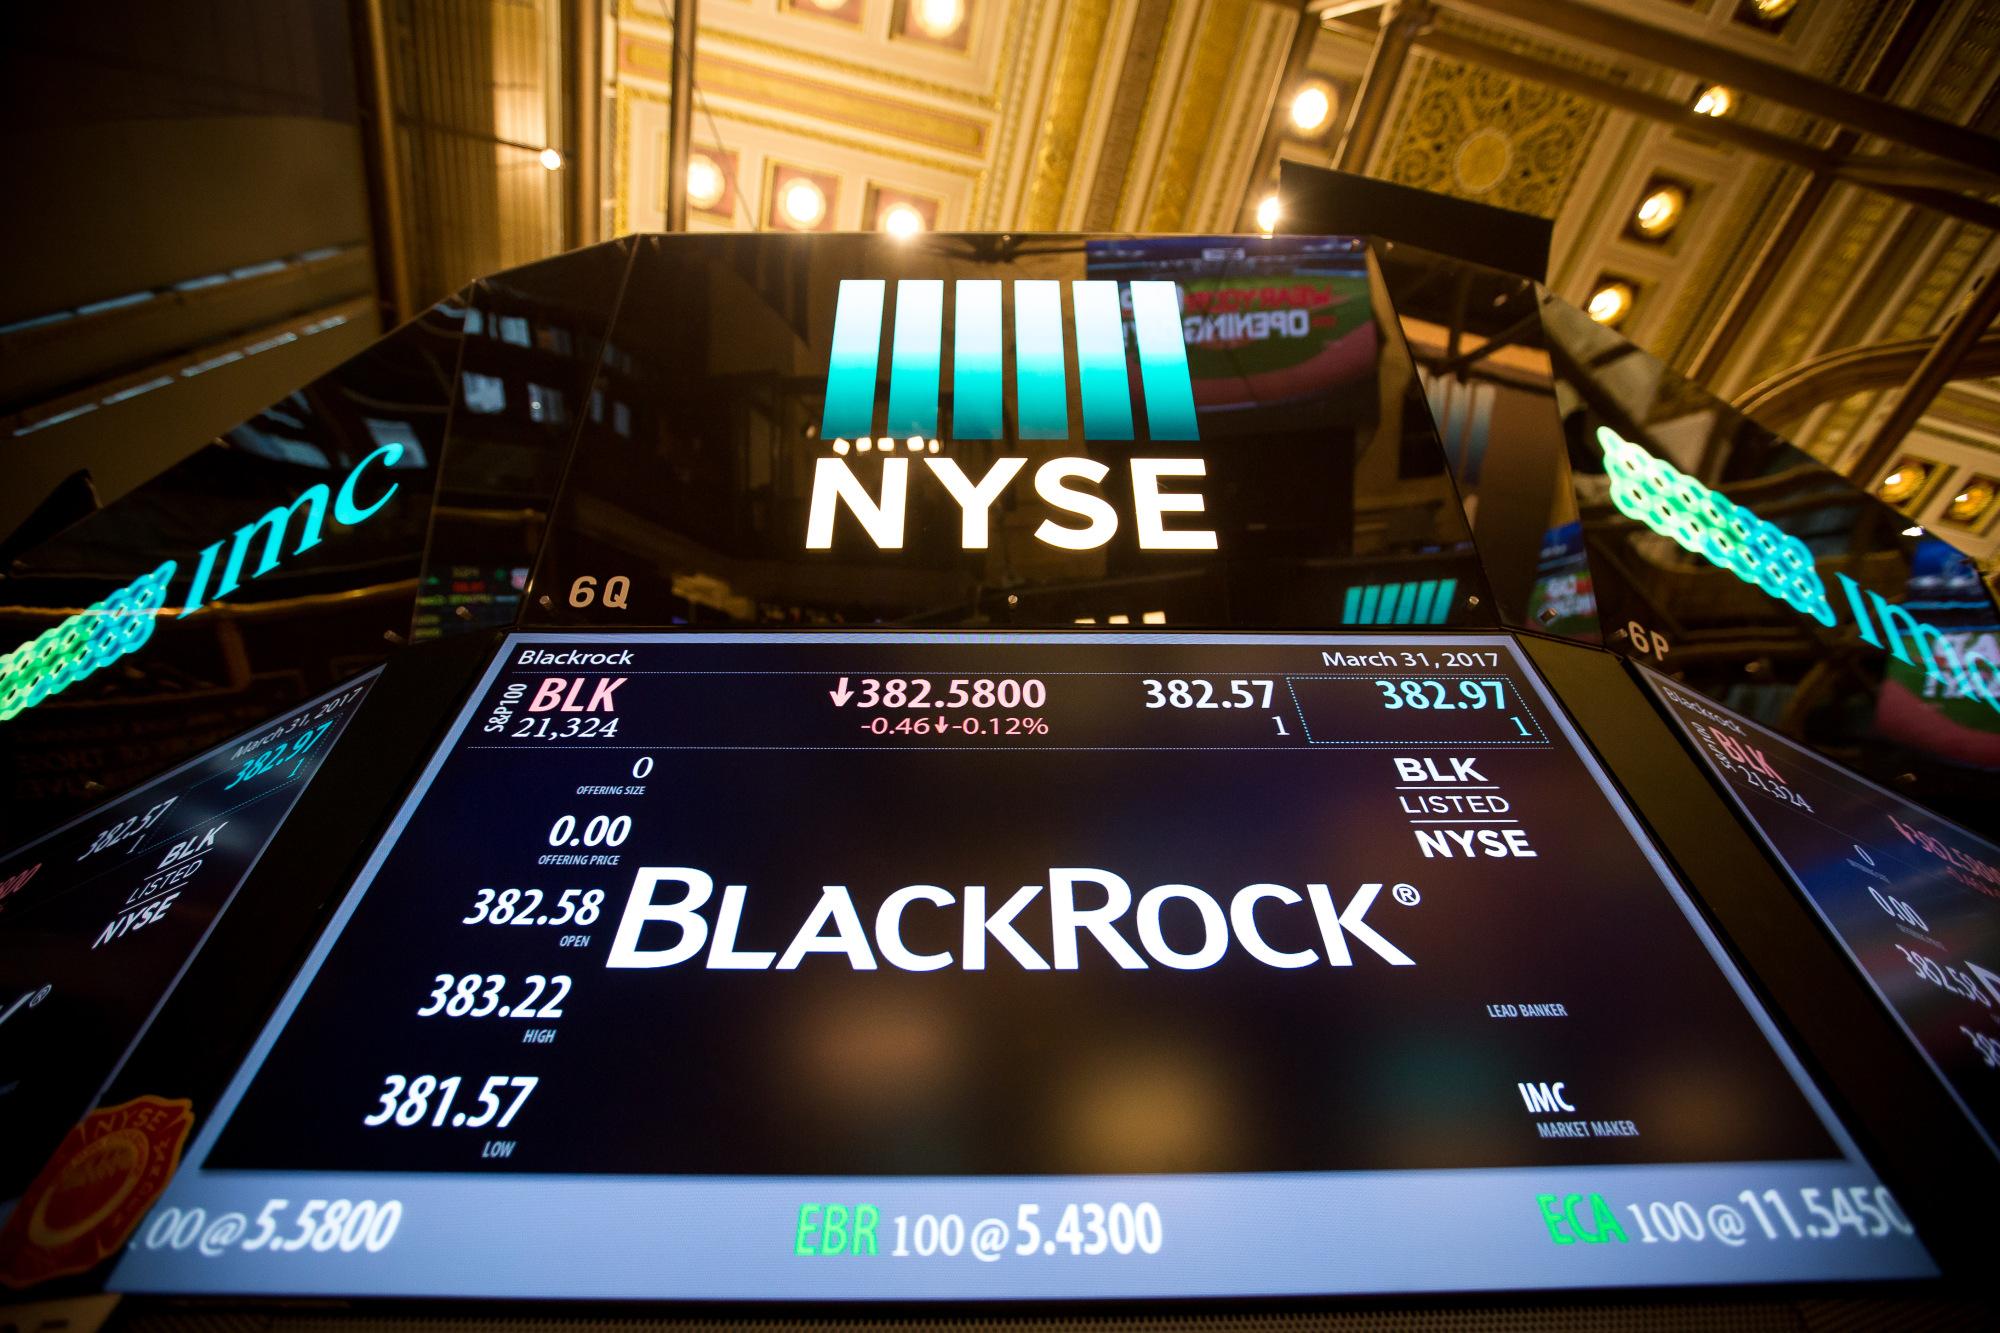 BlackRock, Wells Fargo said to push ESG funds in 401(k)s